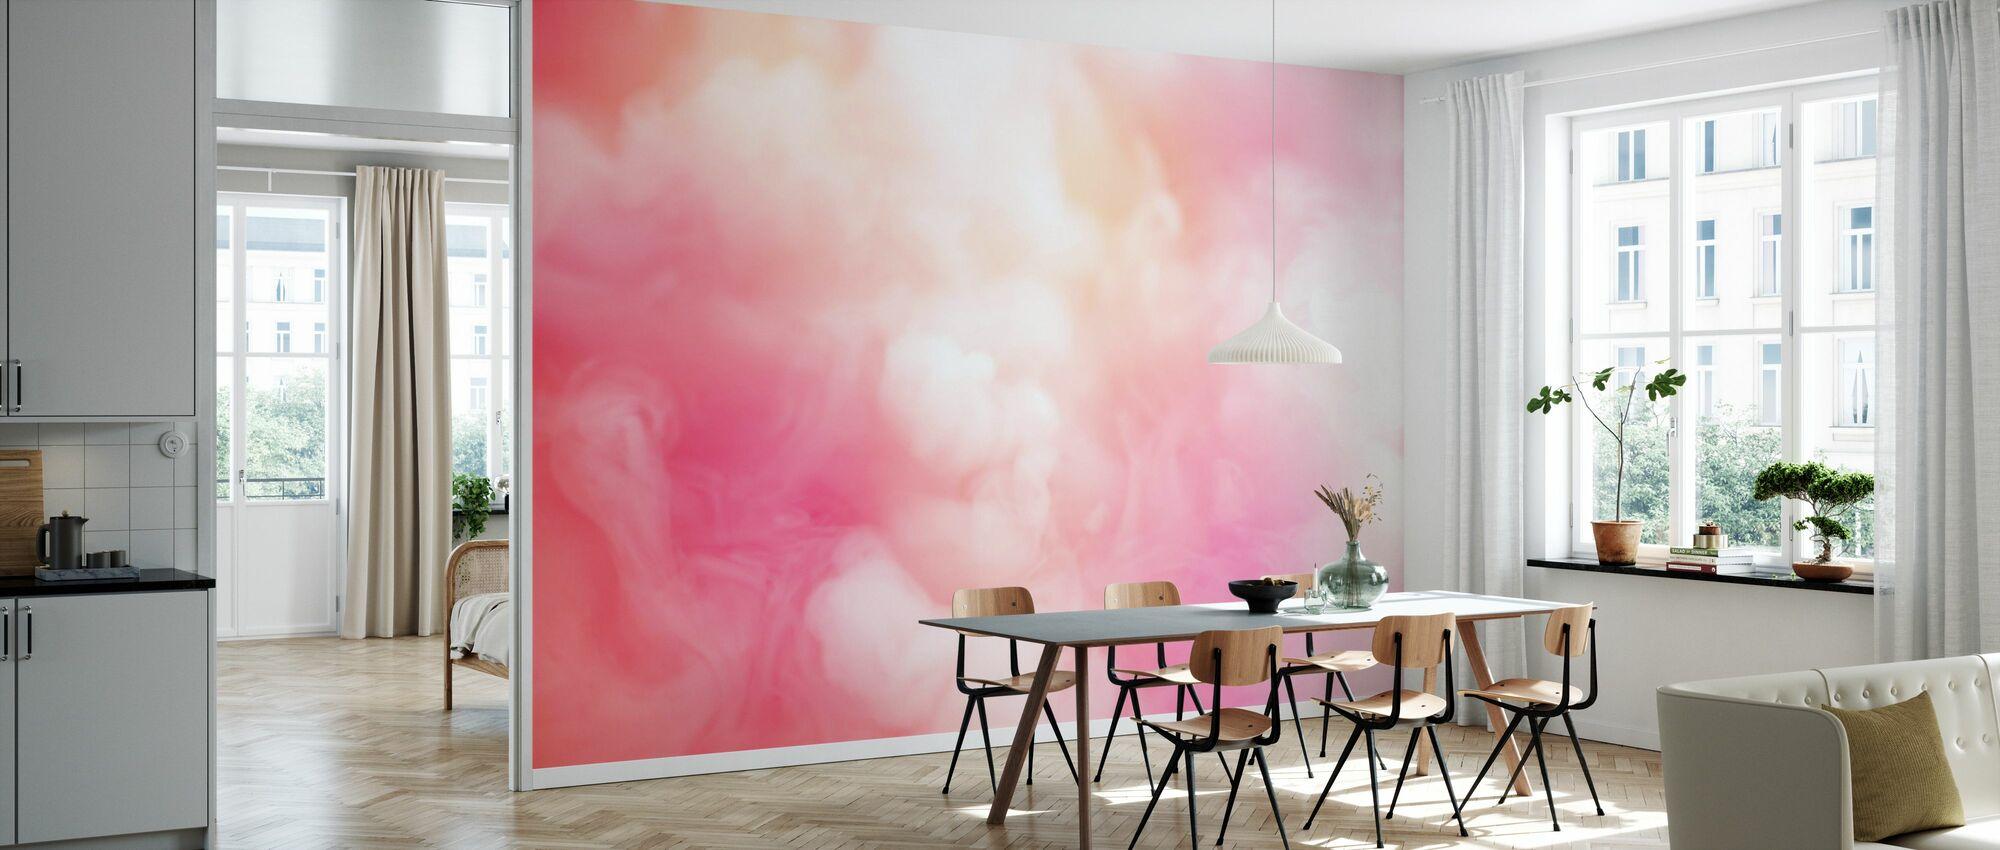 Swirling Smoke - Wallpaper - Kitchen